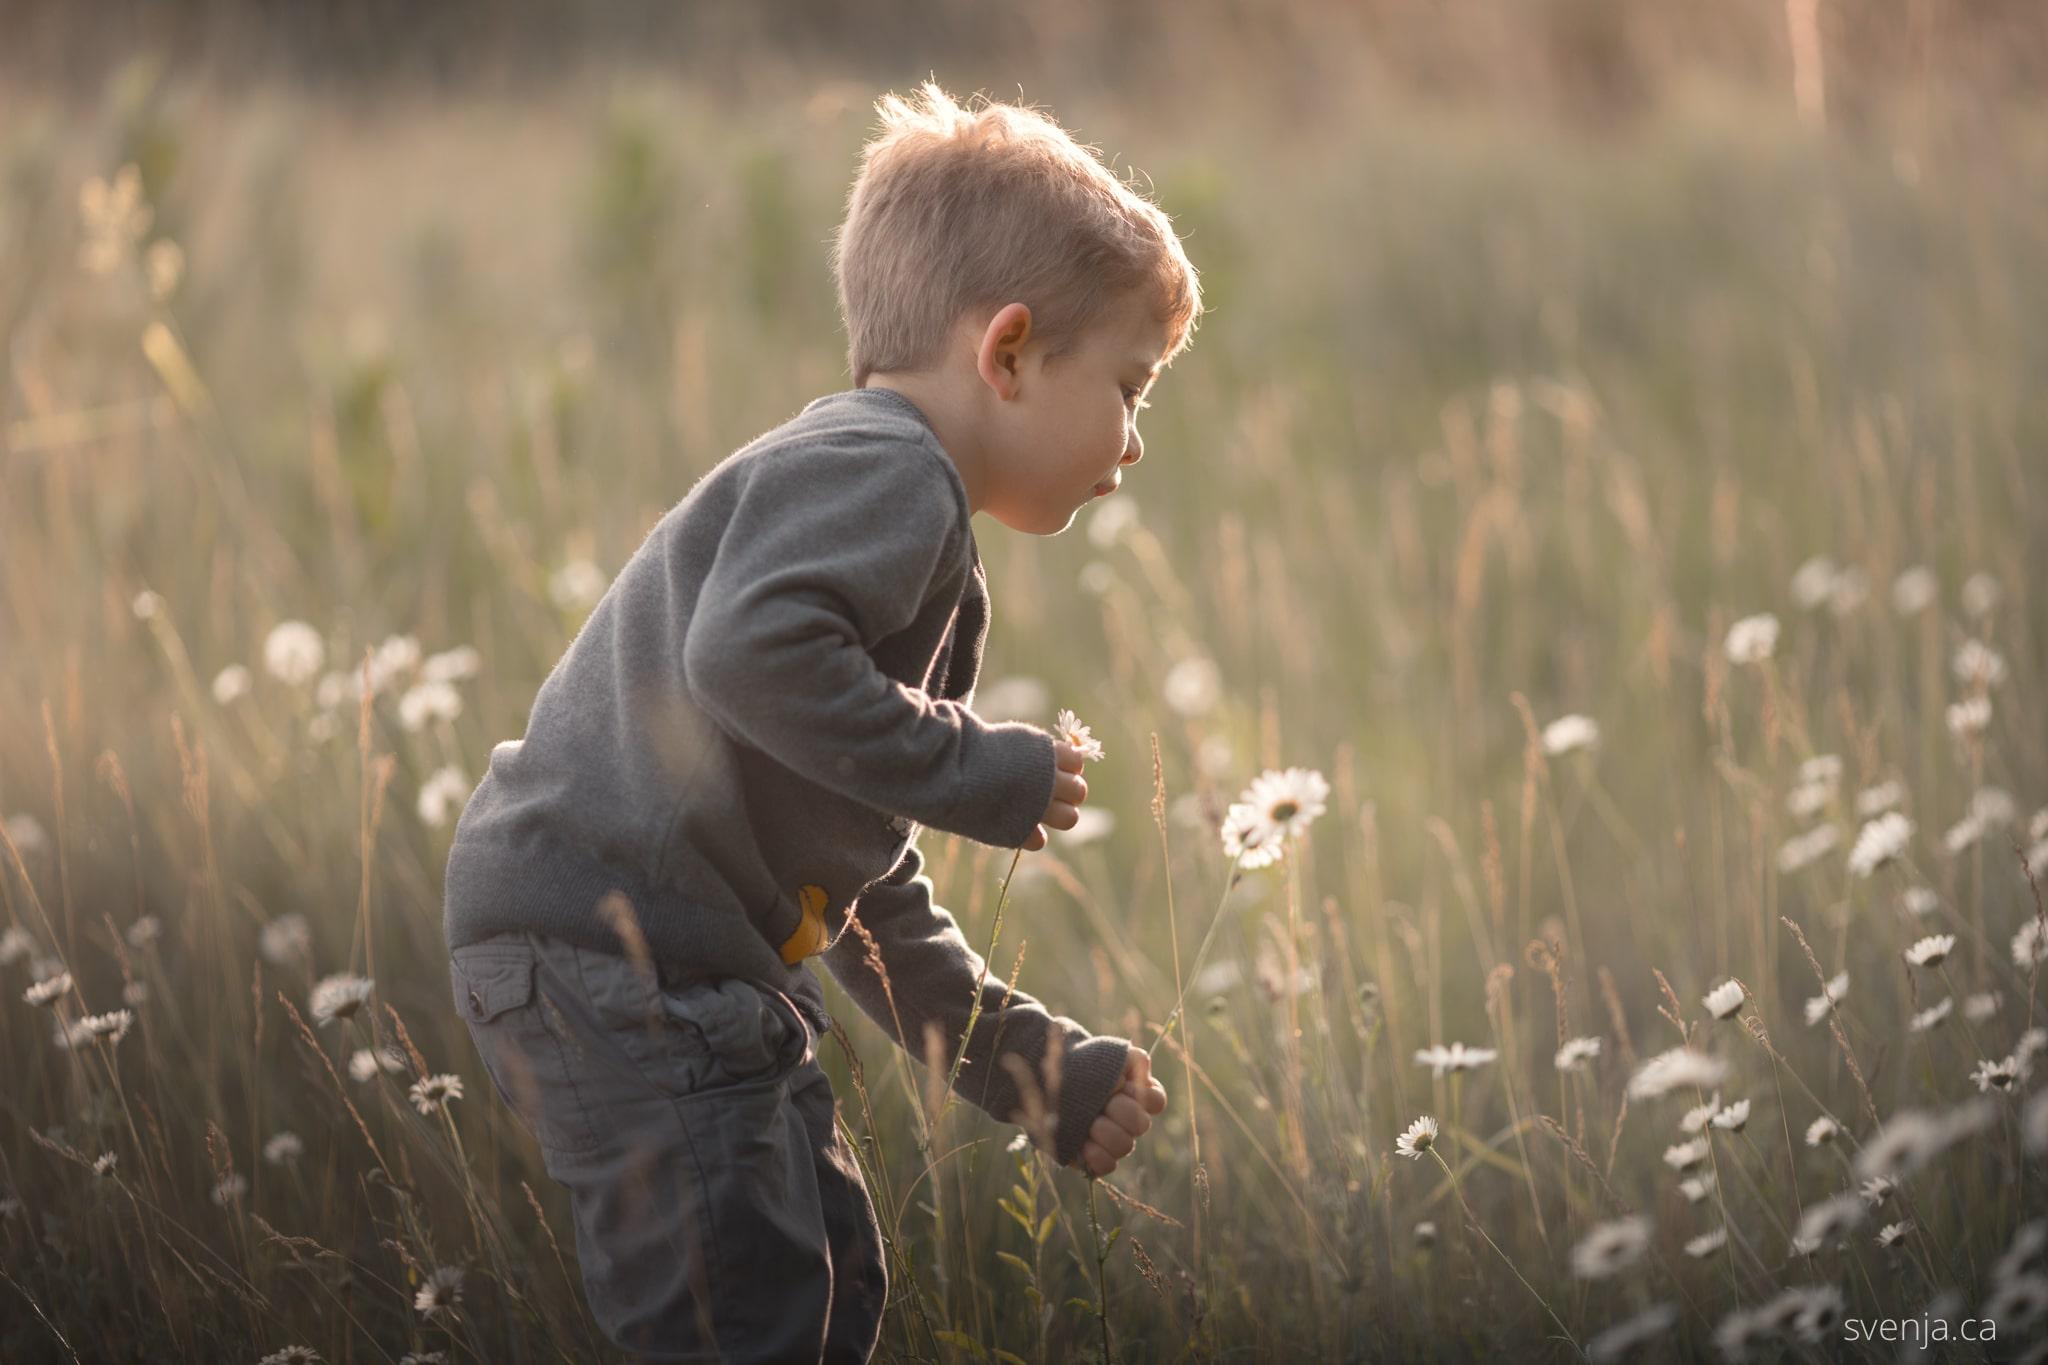 young boy picks flowers in a field.